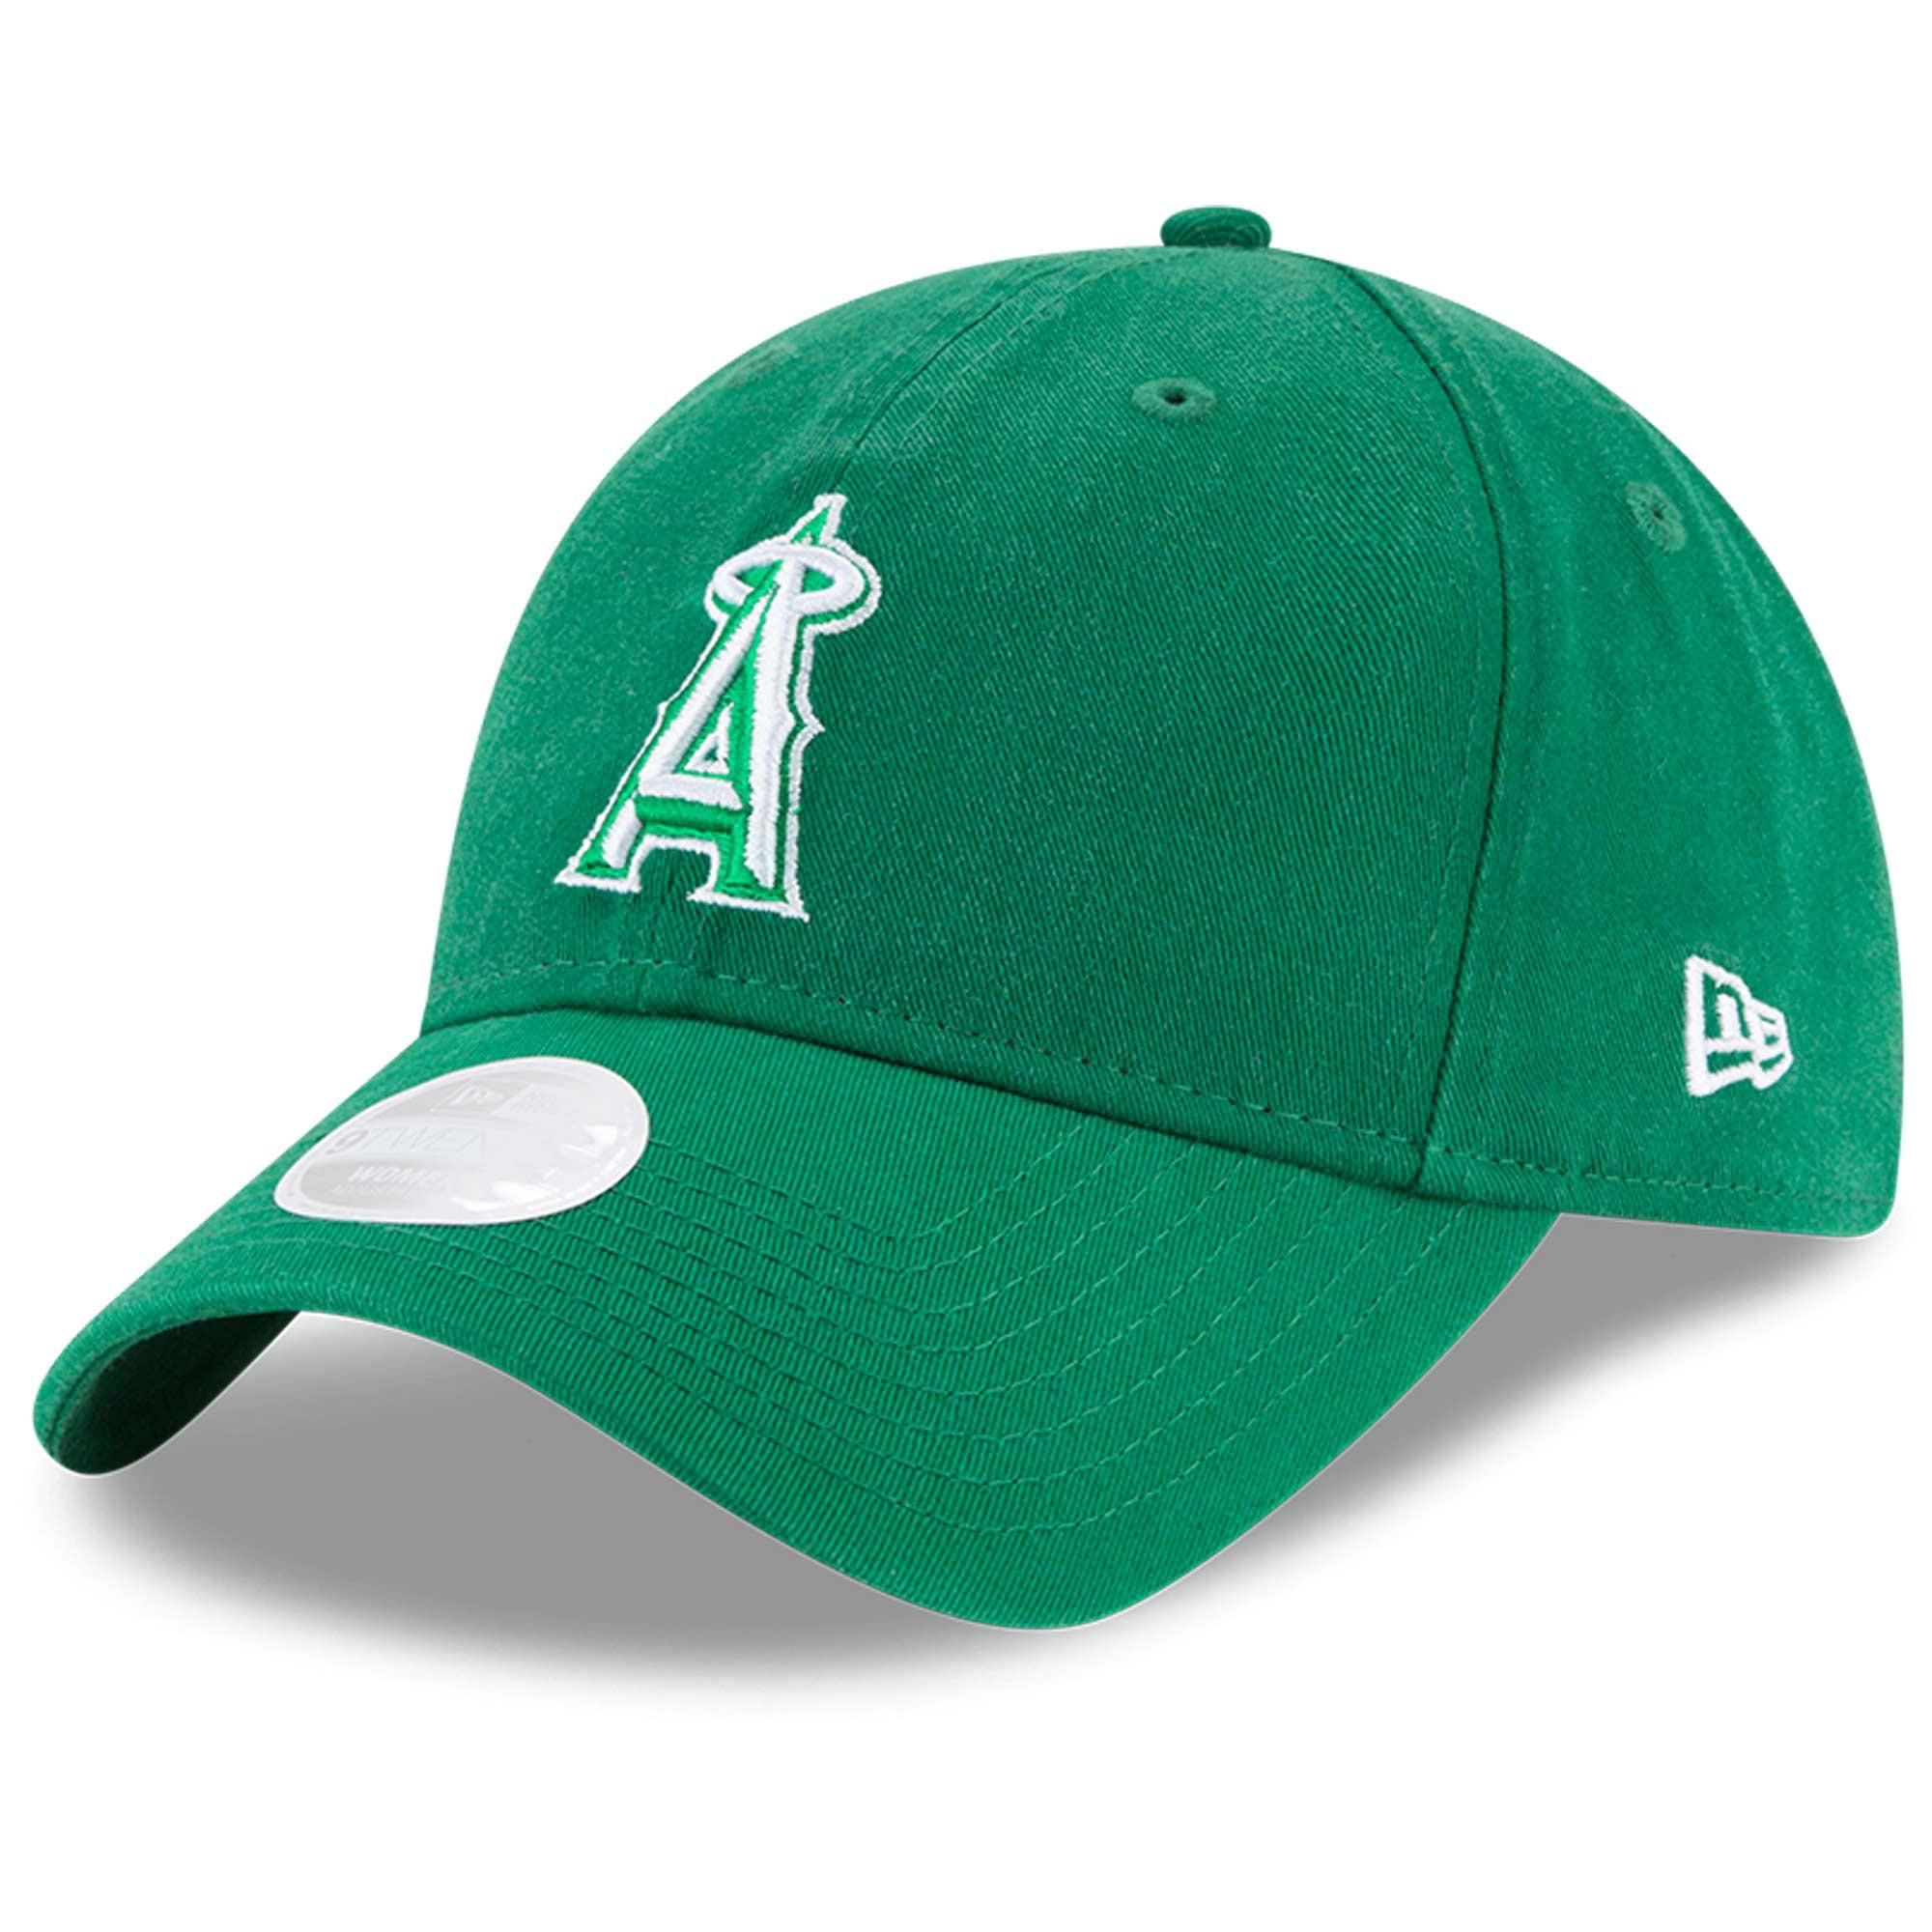 Los Angeles Angels New Era Women's Core Classic Twill St. Patrick's Day 9TWENTY Adjustable Hat - Green - OSFA